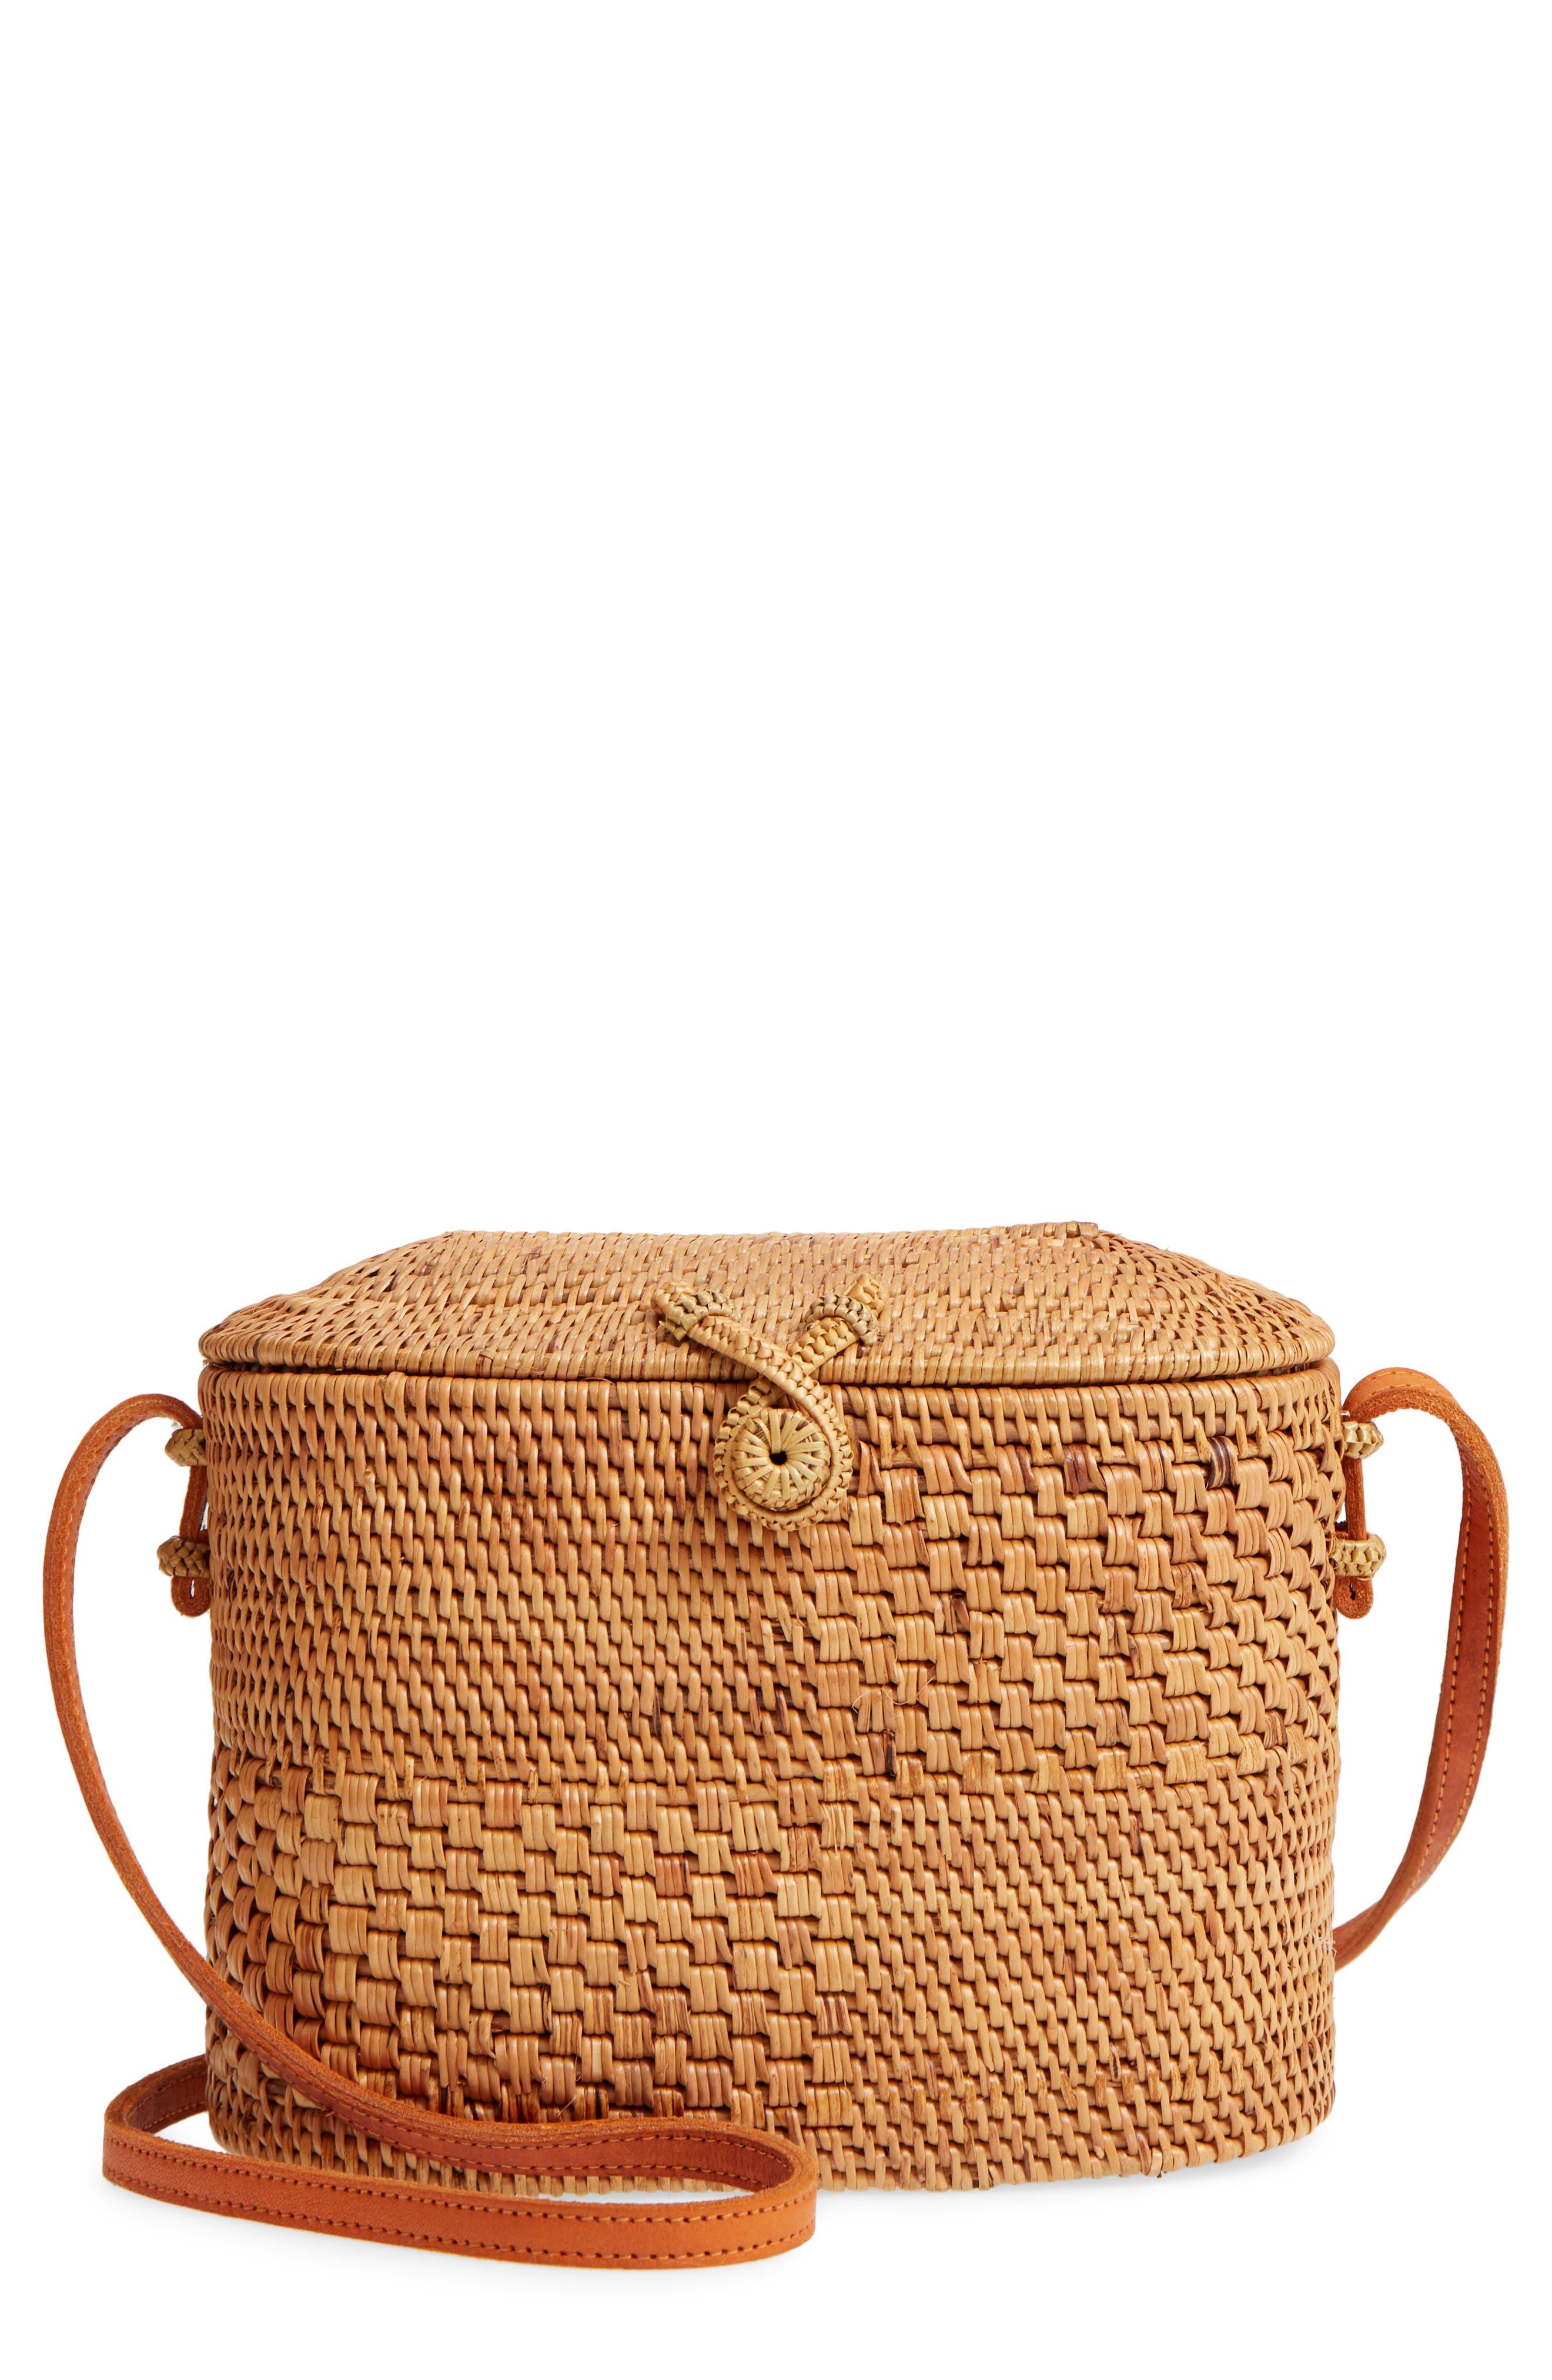 Woven Rattan Box Crossbody Bag,                             Main thumbnail 1, color,                             Tan